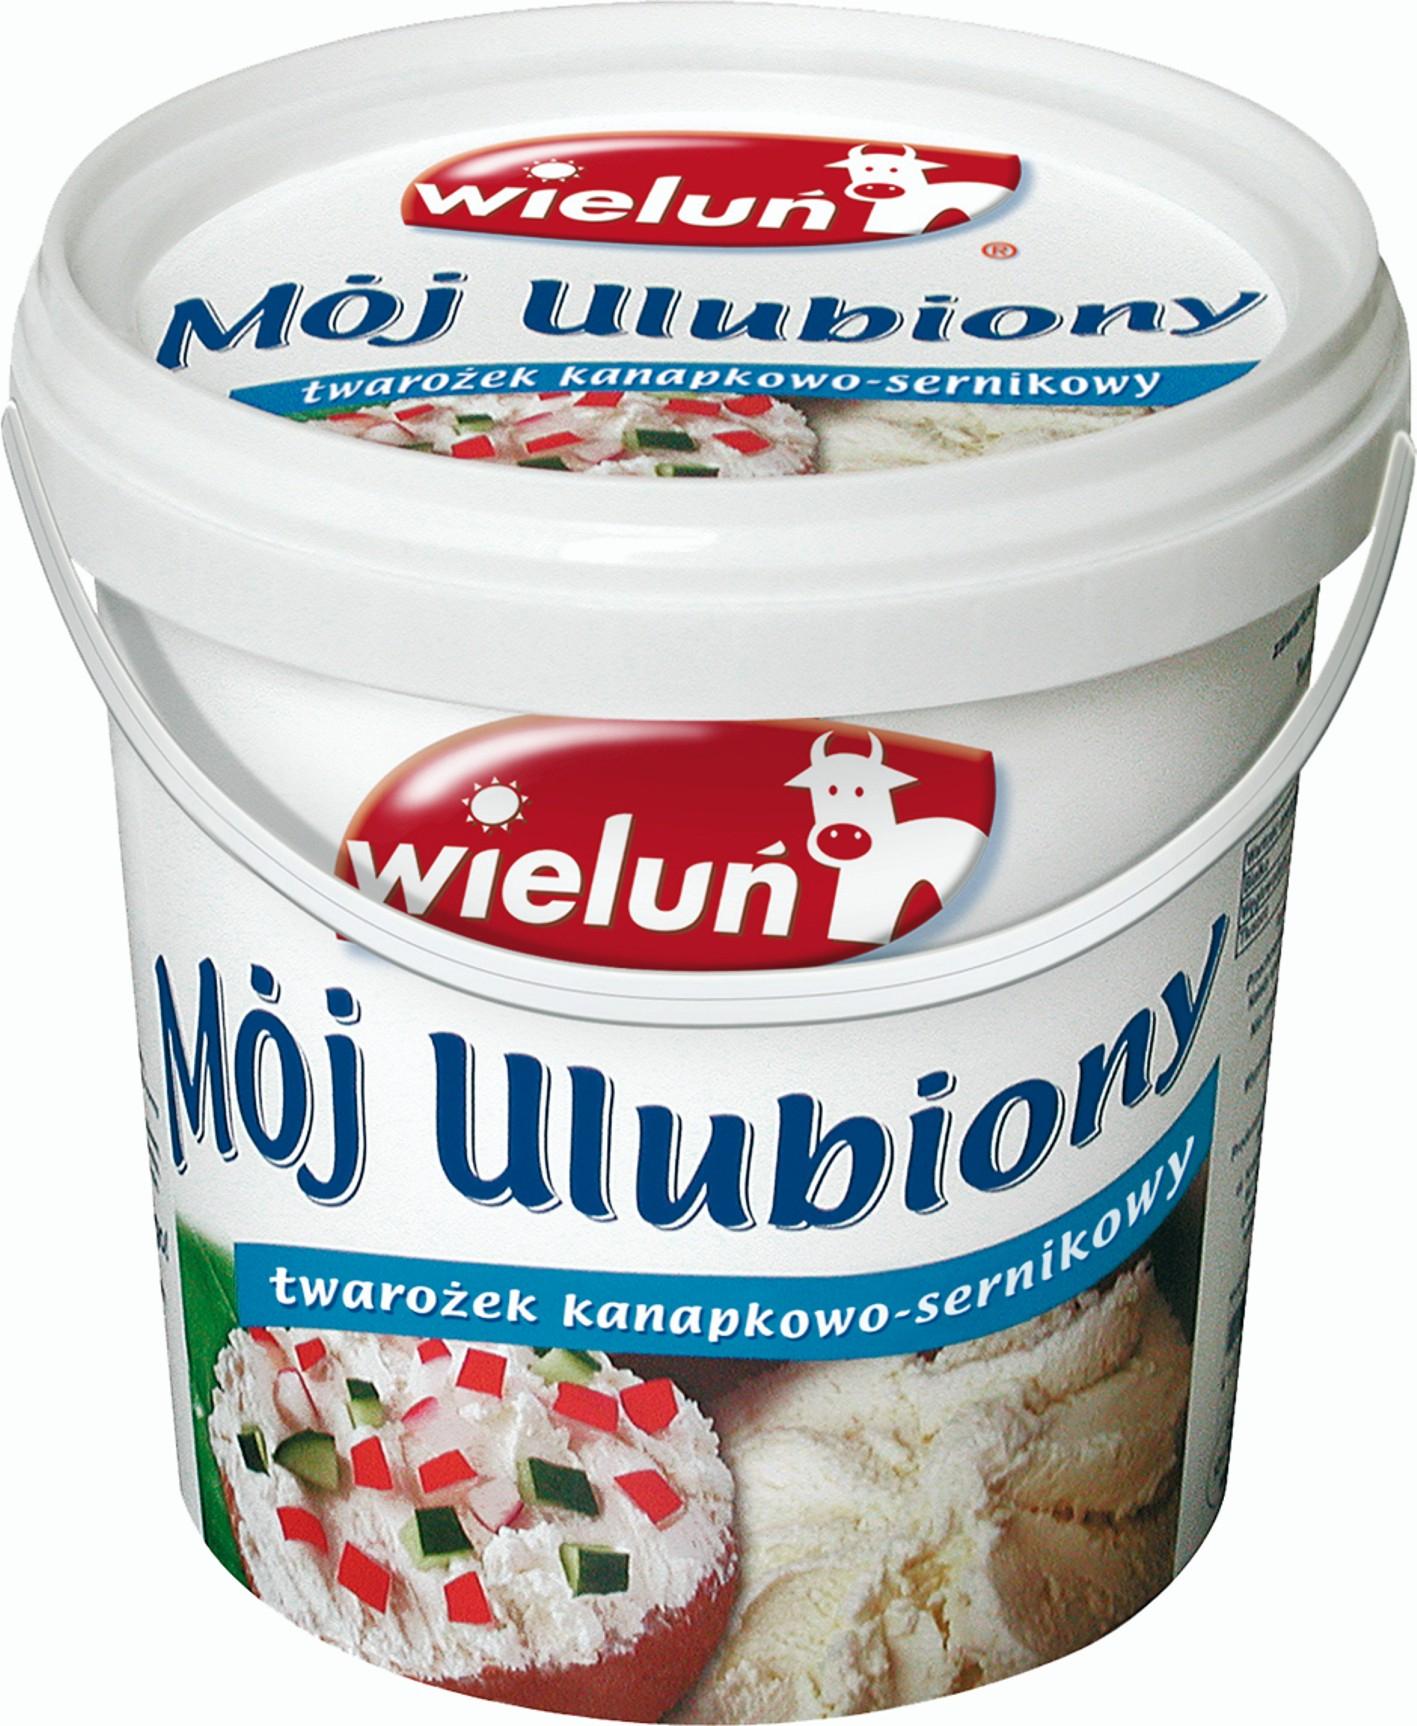 Wieluń - Twaróg Mój Ulubiony 1kg